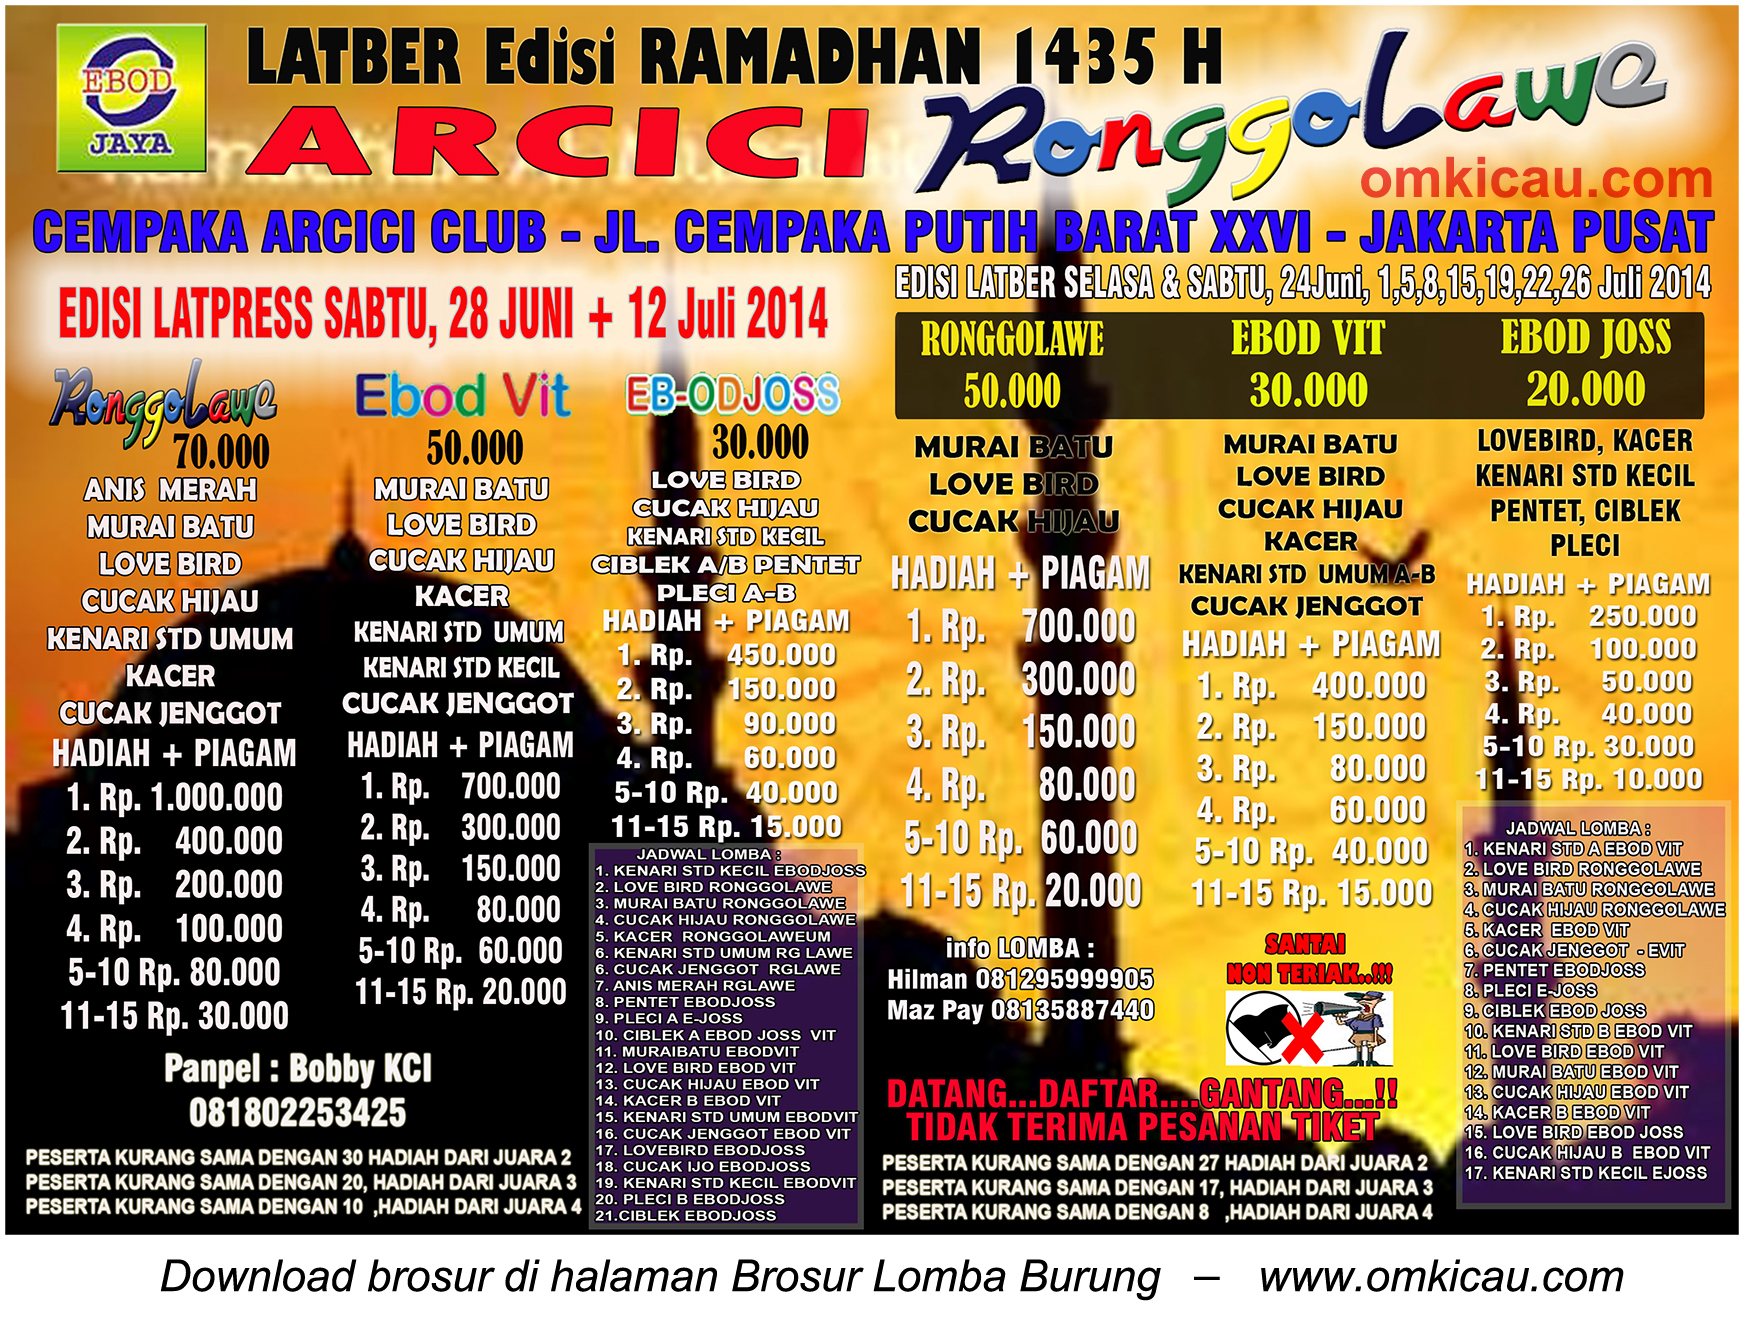 Brosur Latpres Arcici Ronggolawe Edisi Ramadhan, Jakarta Pusat, 28 Juni 2014